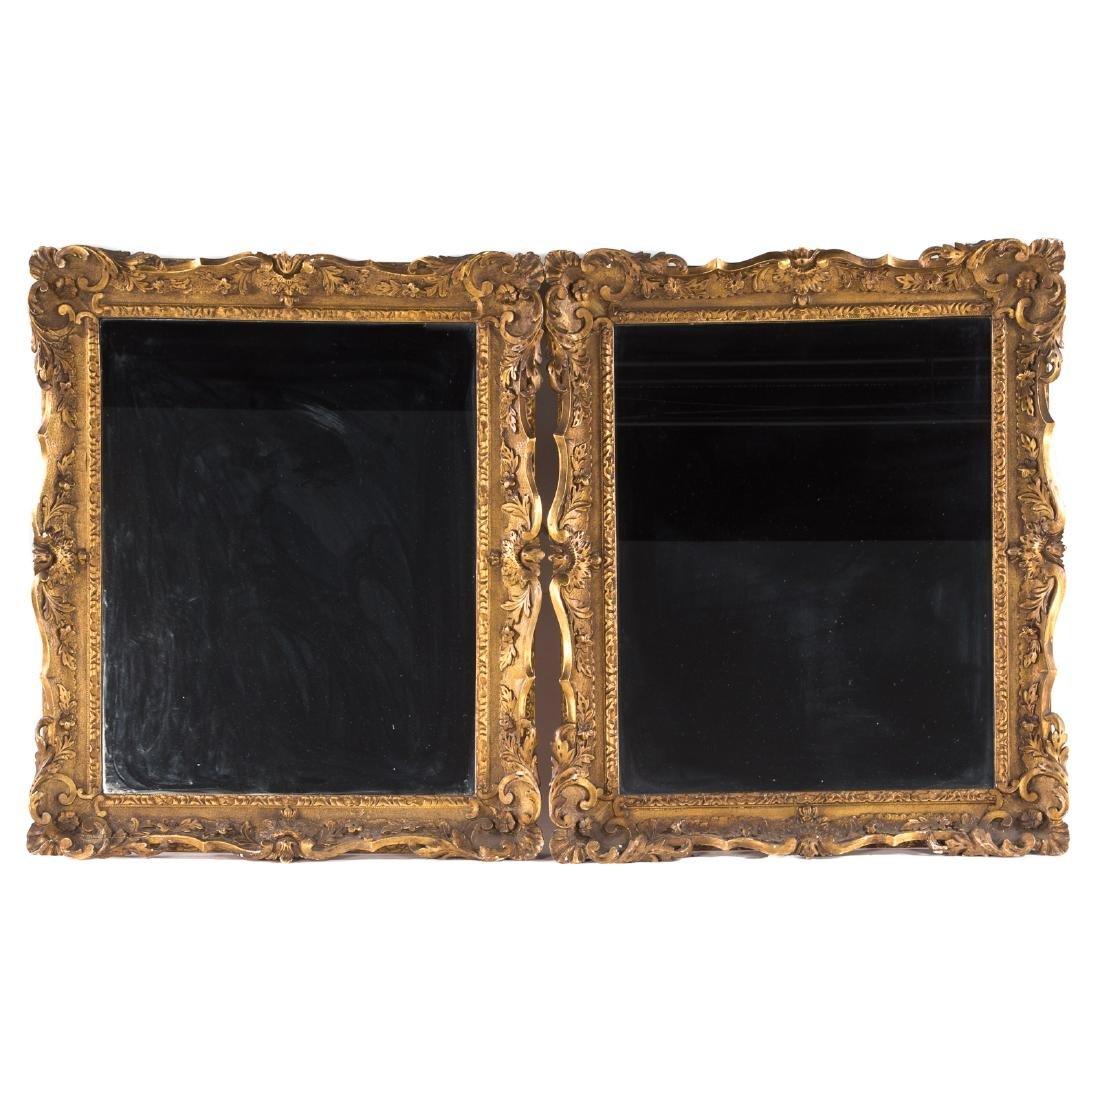 Pair George III Style Carved Giltwood Mirrors